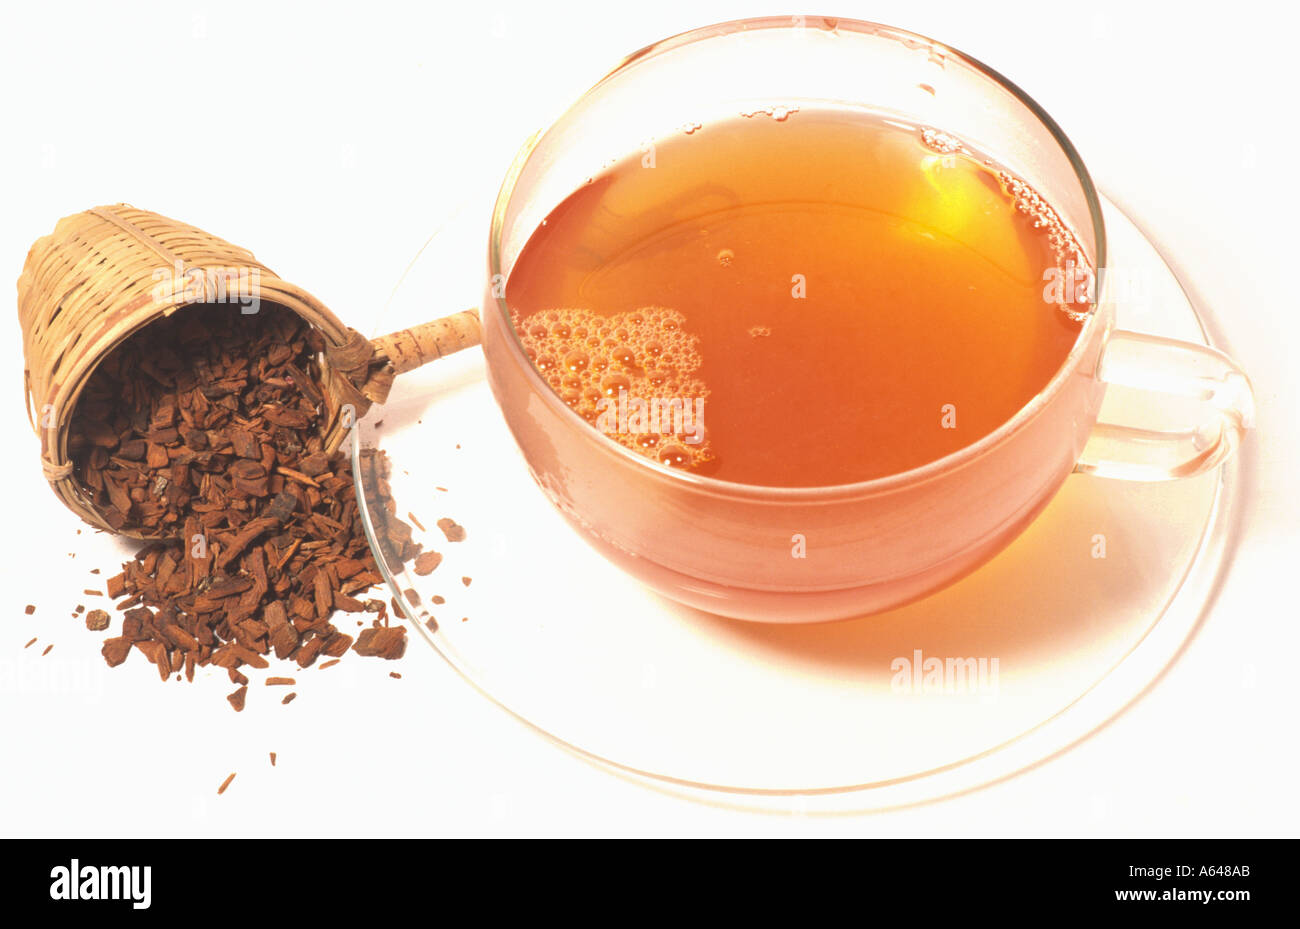 Chinarinde China calisaya ledgeriana Chinabork tea Immagini Stock